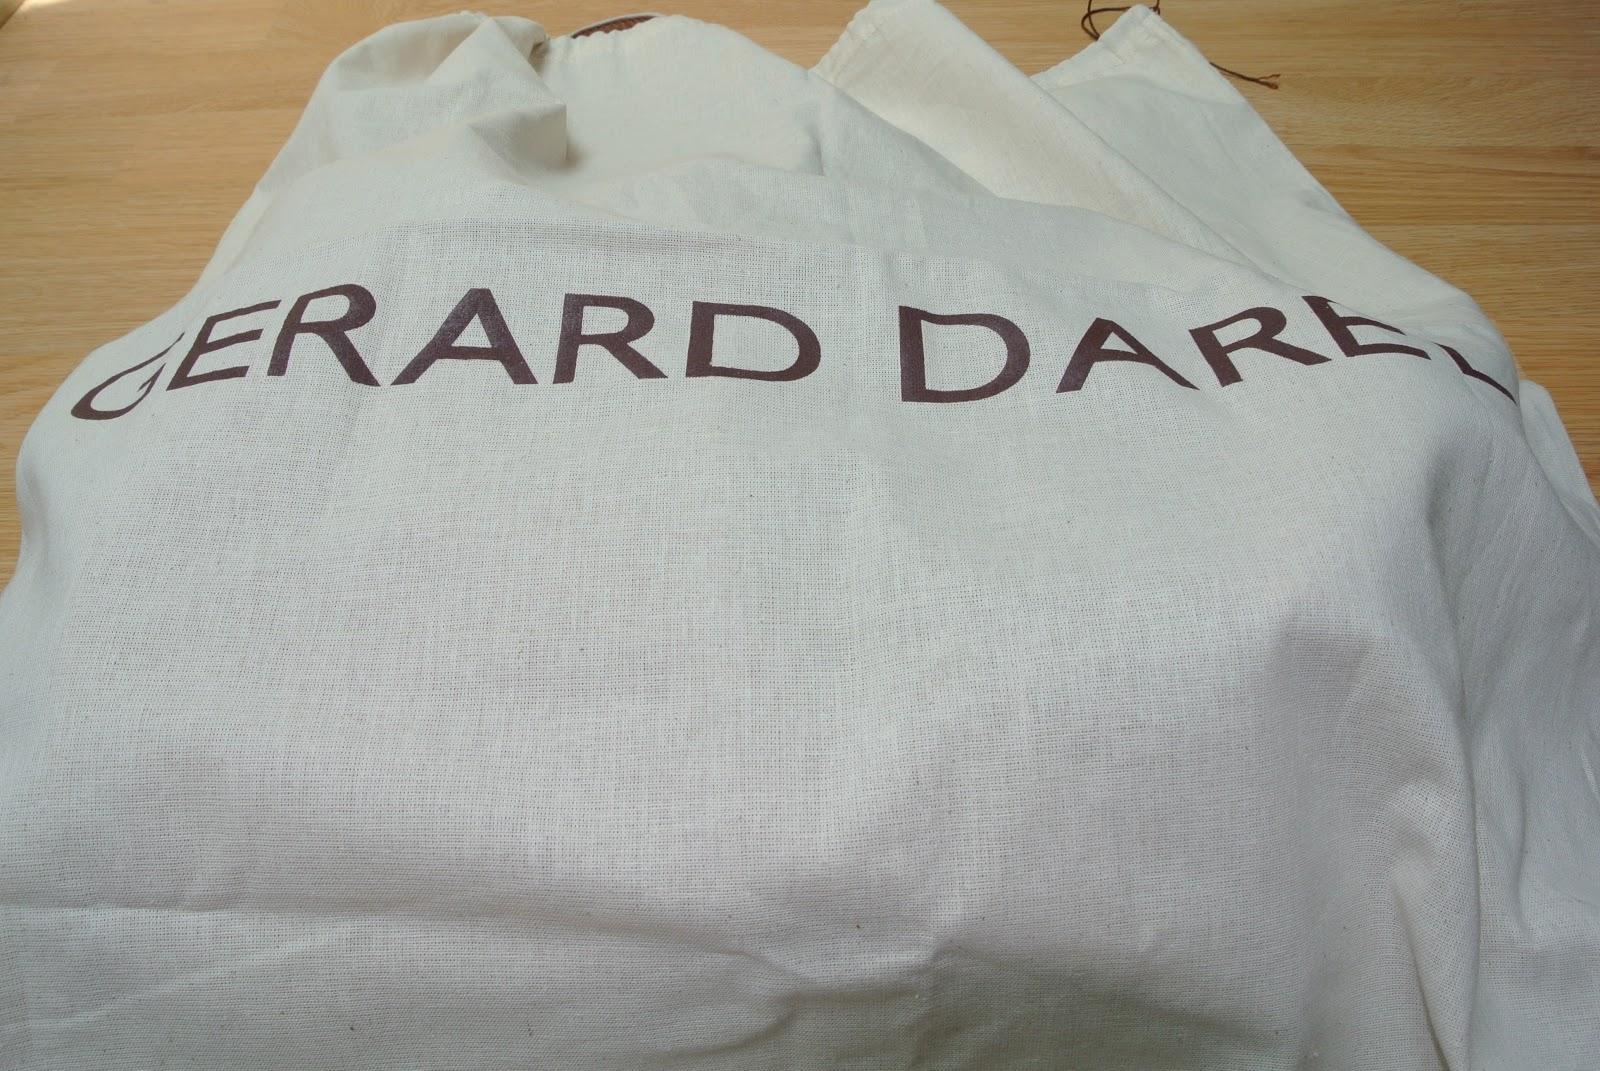 Le Blog de Luciana Drey  Le Simple Bag Bahia de Gerard Darel 15f3a8455c48